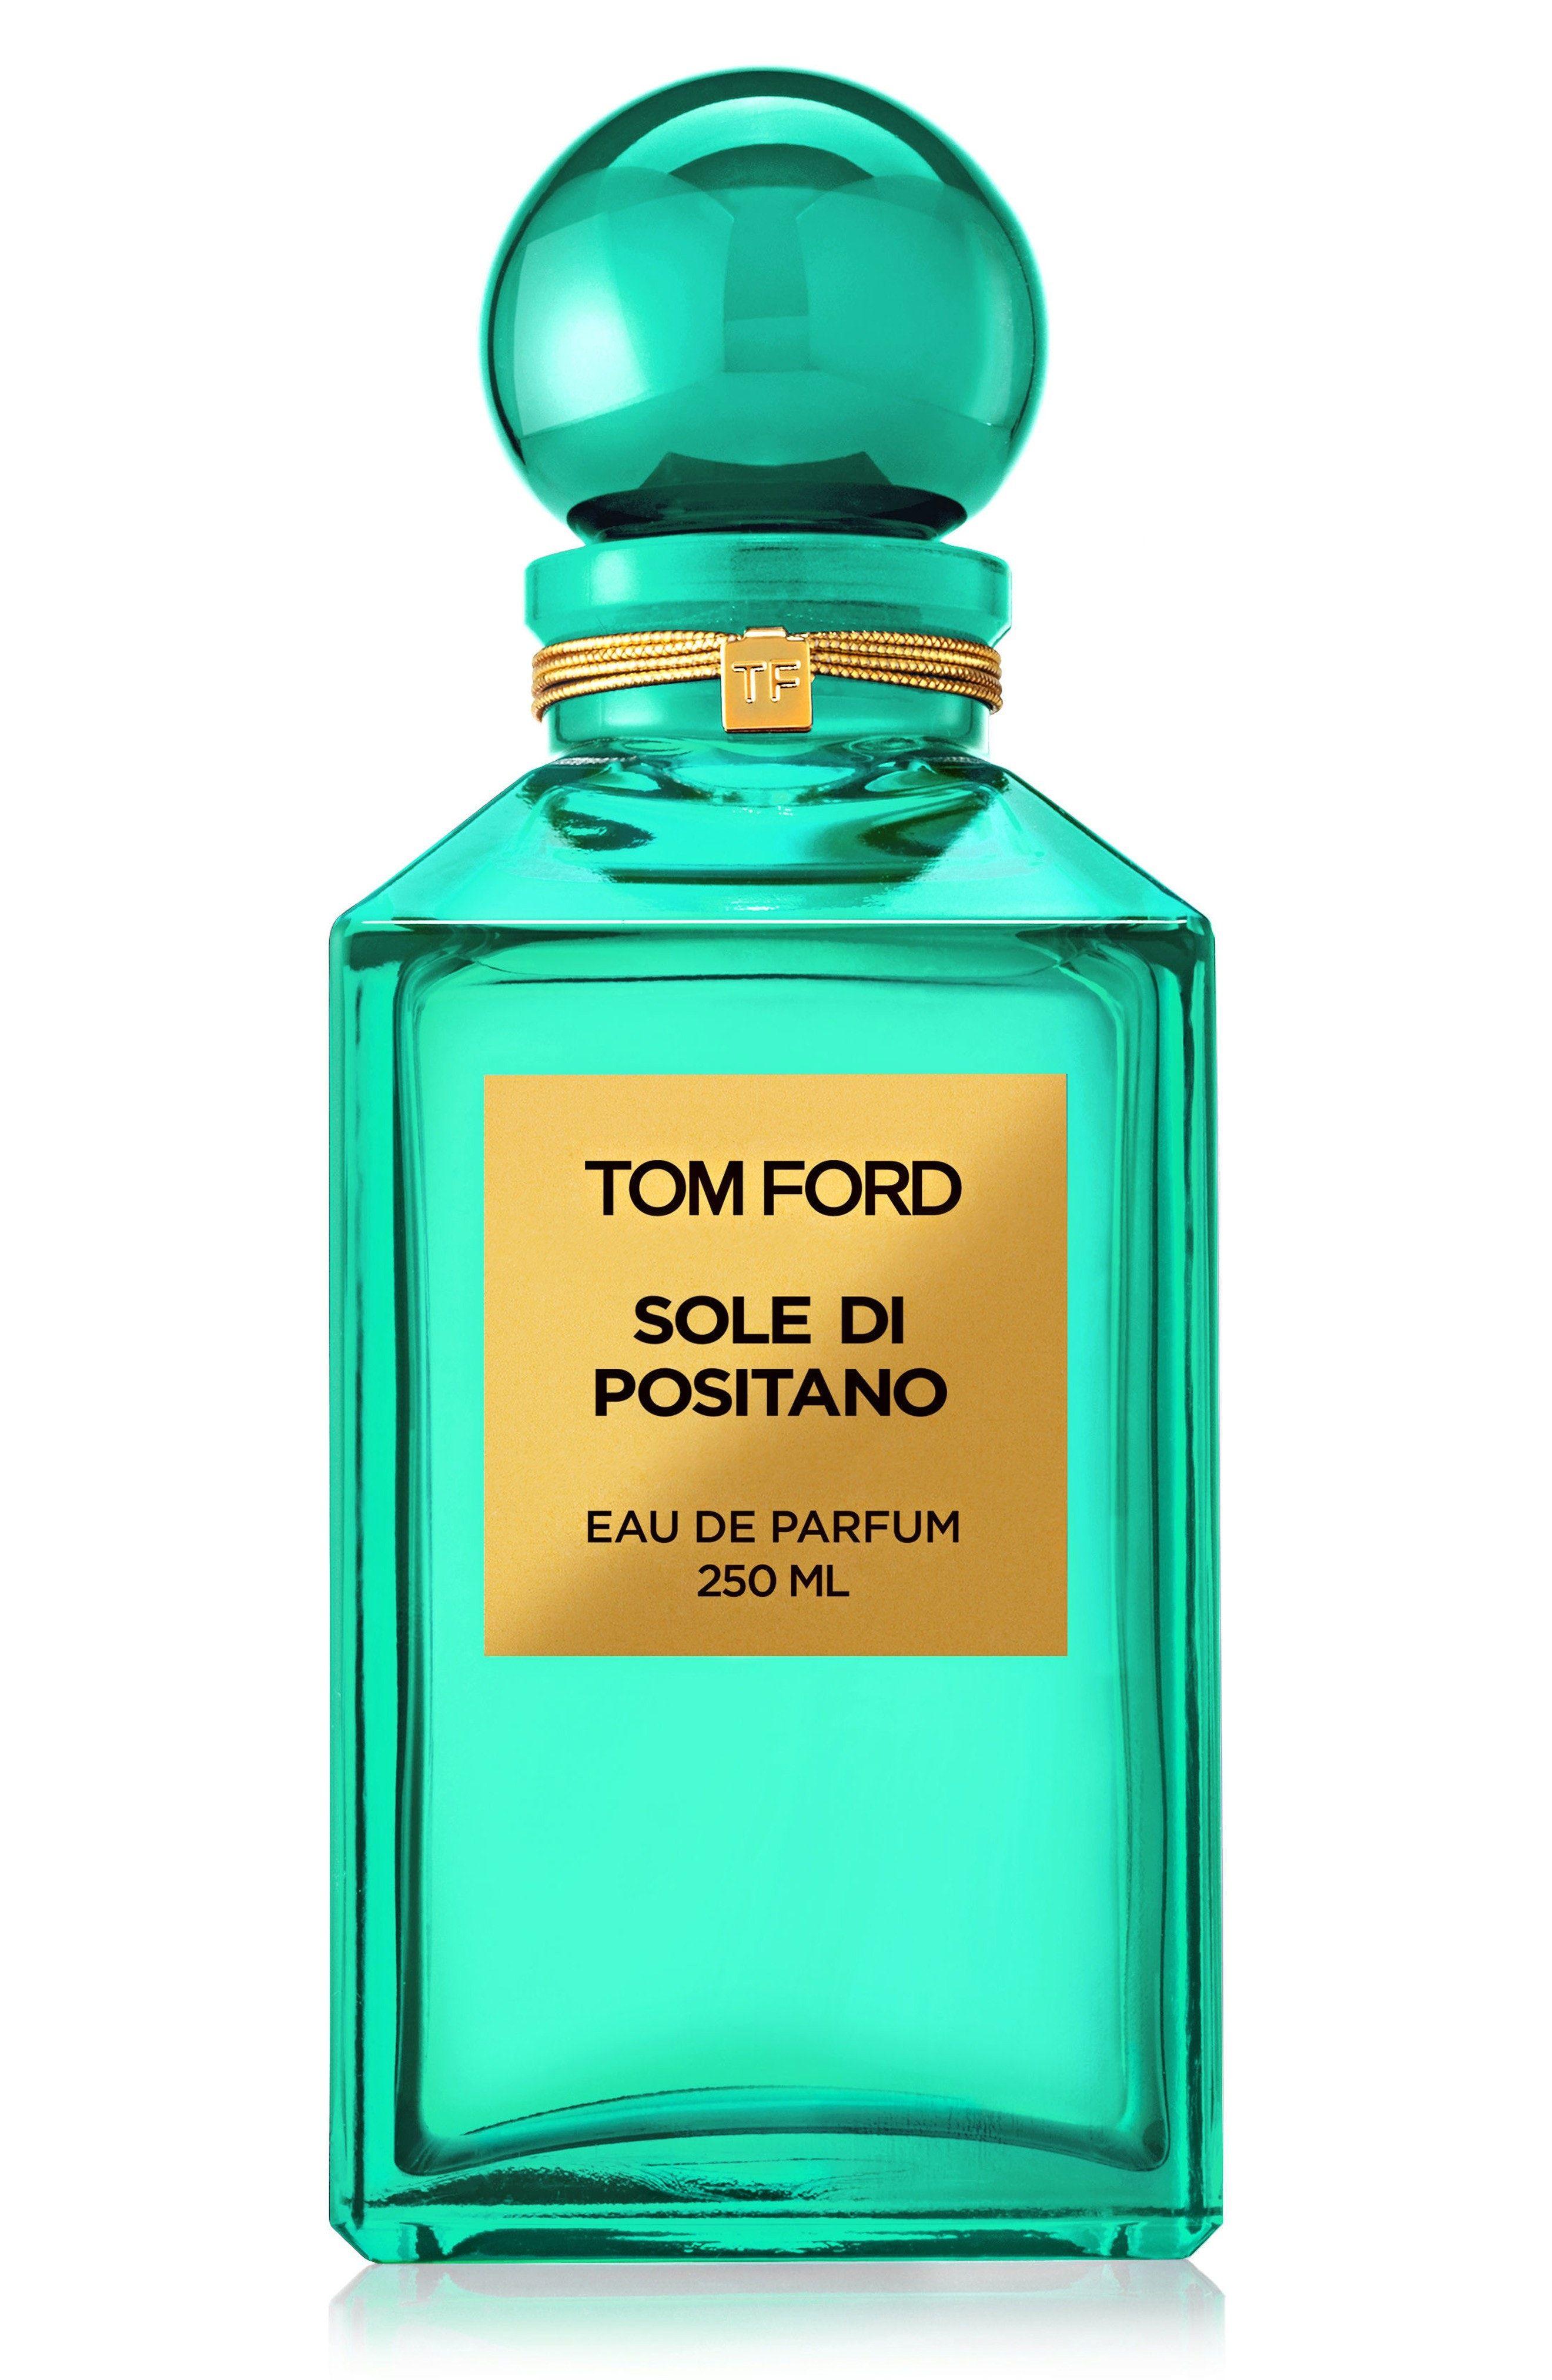 de337ade50 New Tom Ford Private Blend Sole di Positano Eau de Parfum Decanter fashion  online. [$595]topshoppingonline top<<